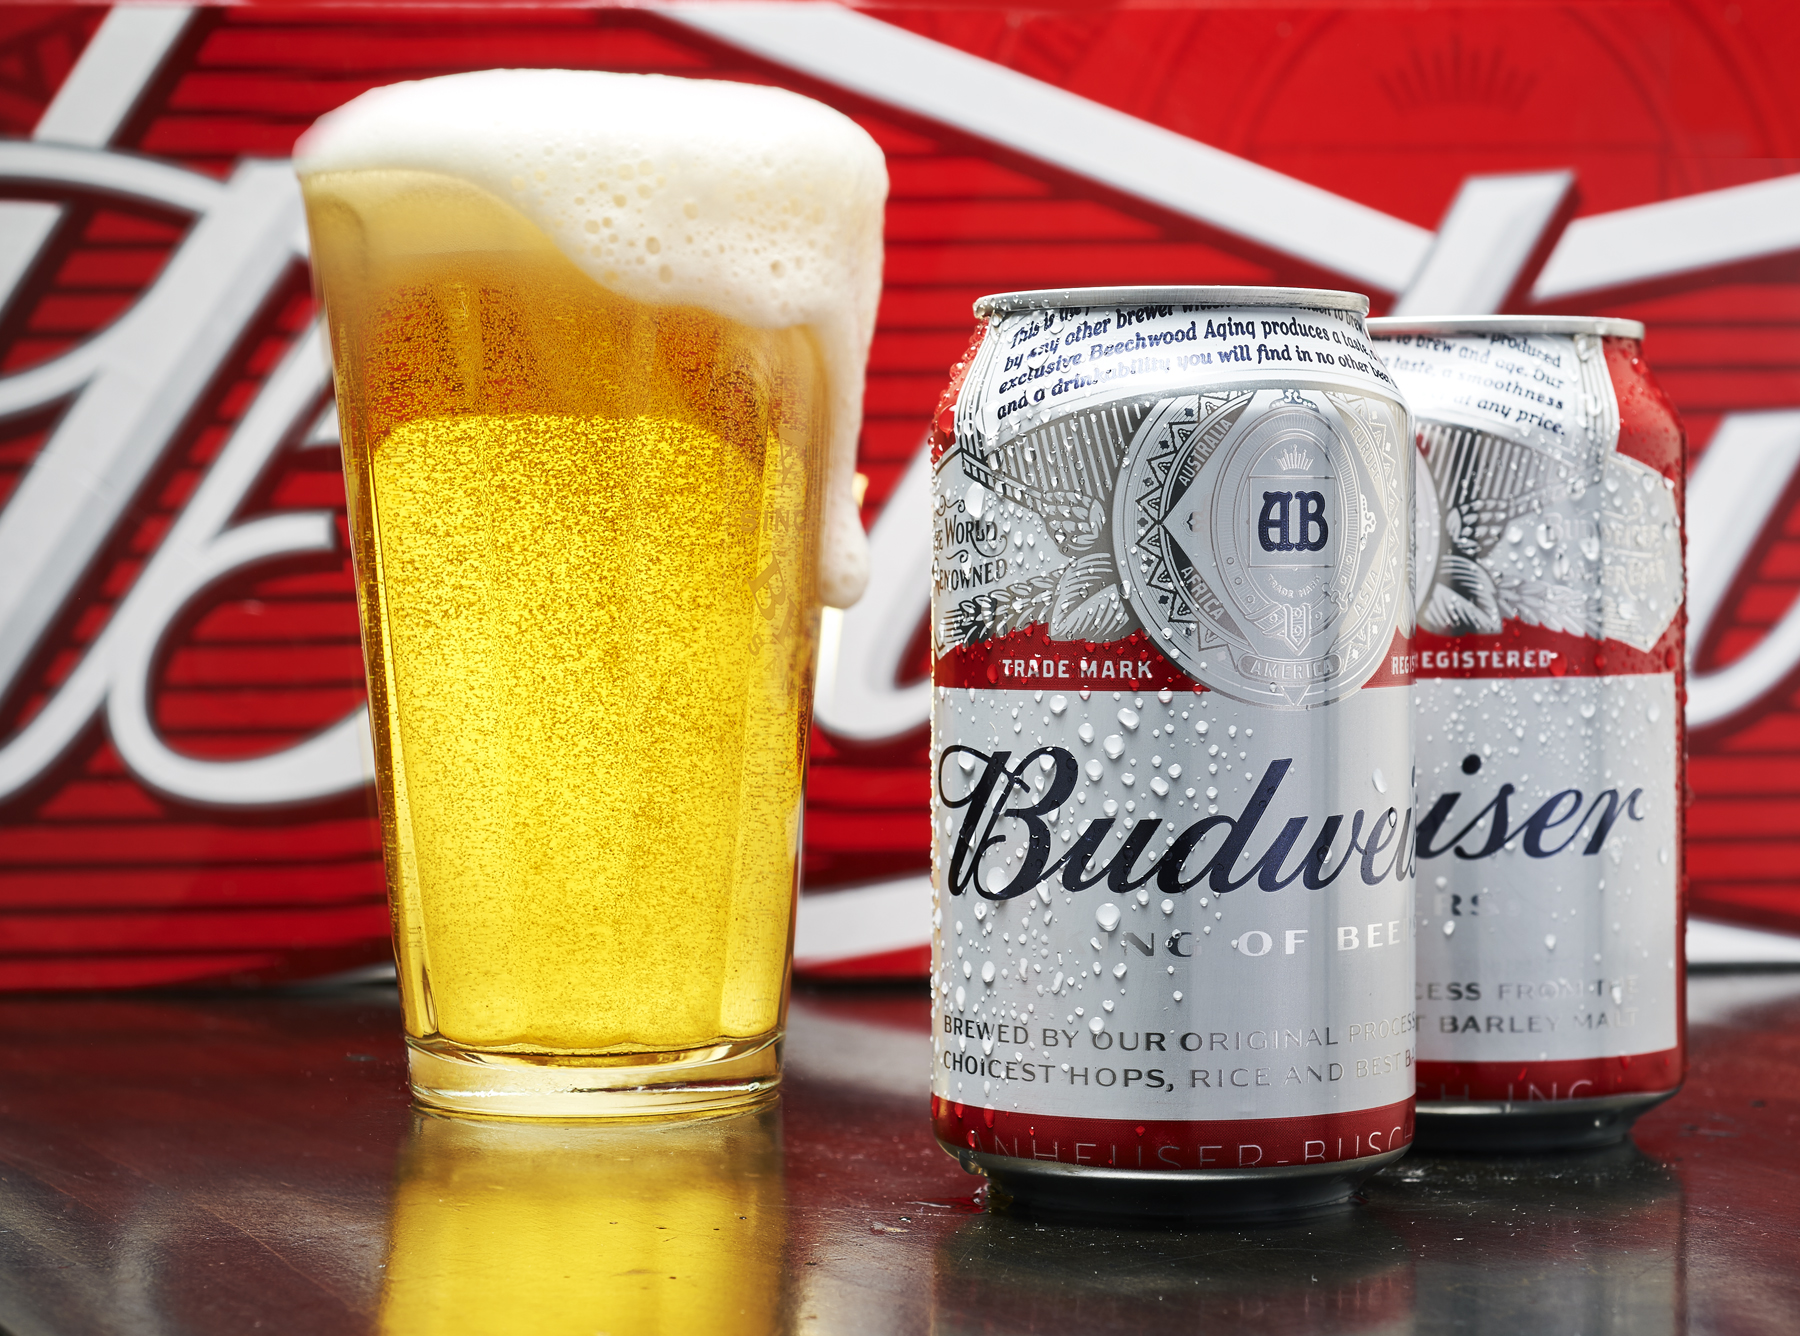 02-05-2017 Budweiser Comp.jpg